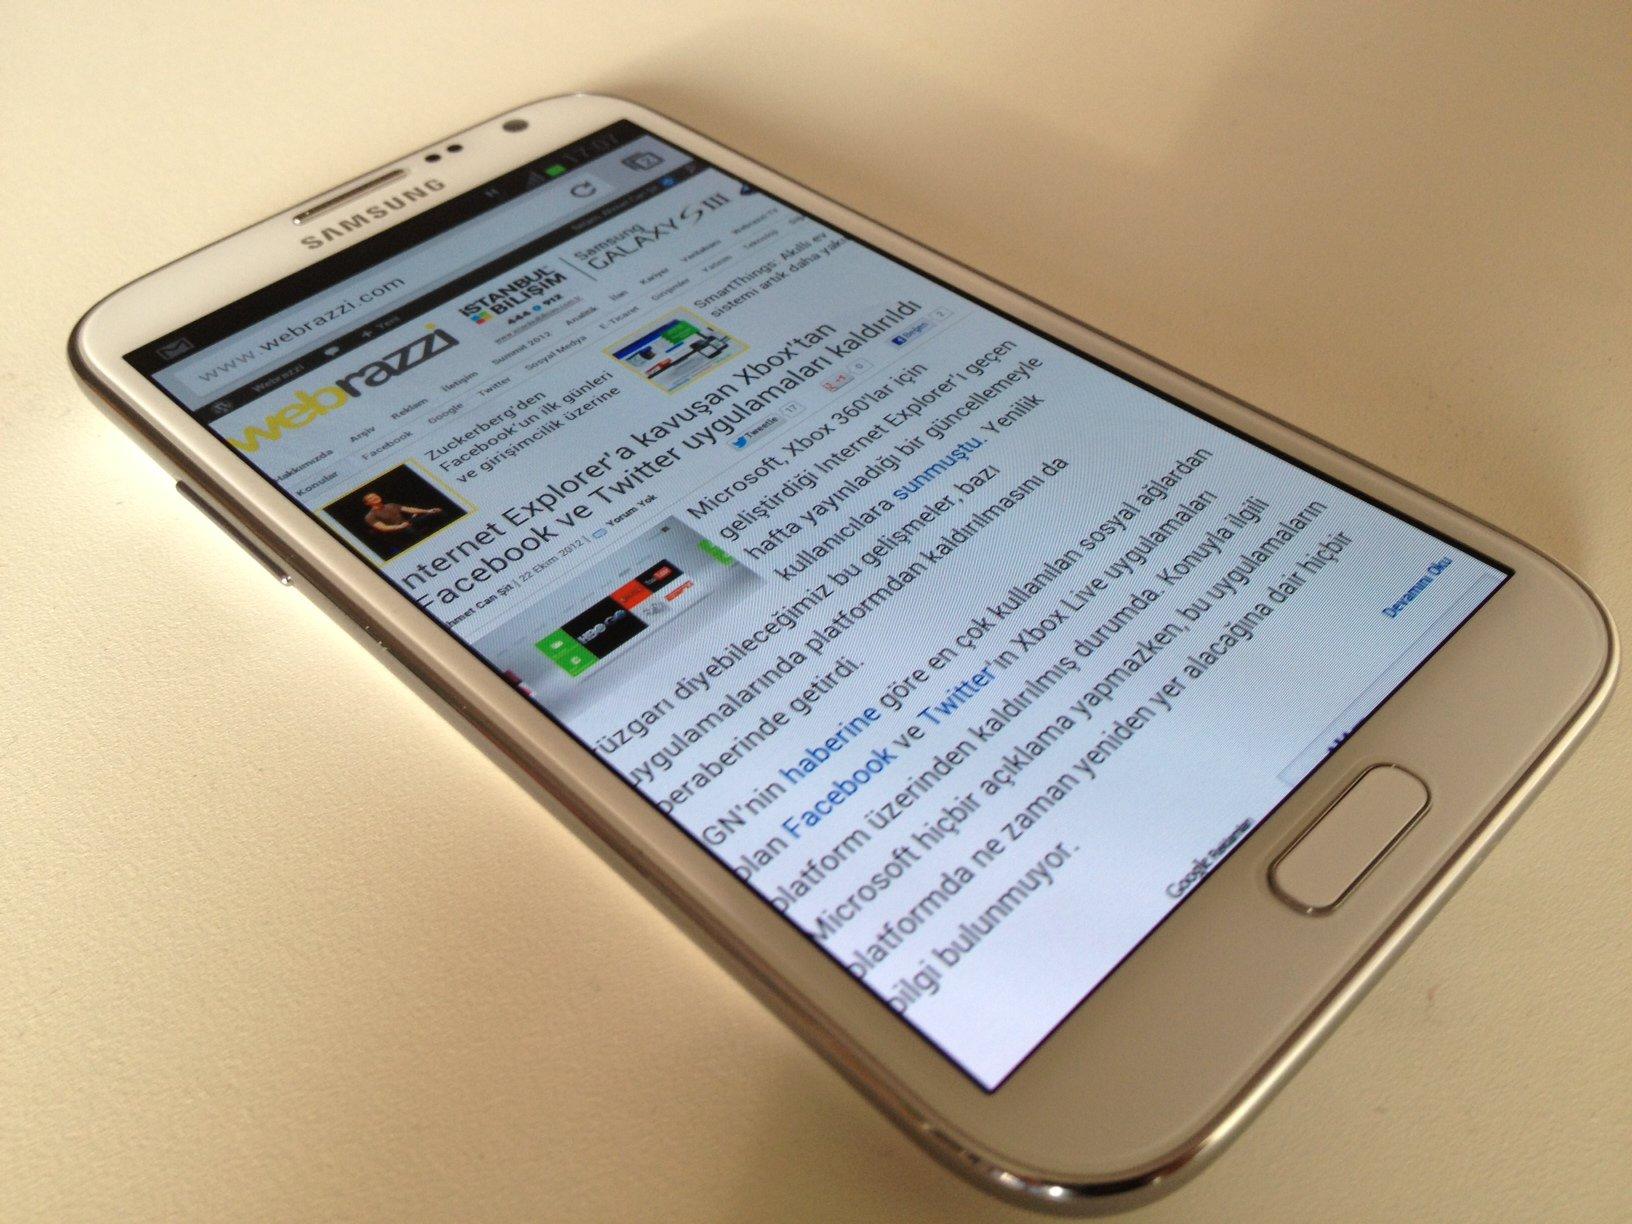 Samsung galaxy note ii yeni segmentin ikinci temsilcisini inceledik